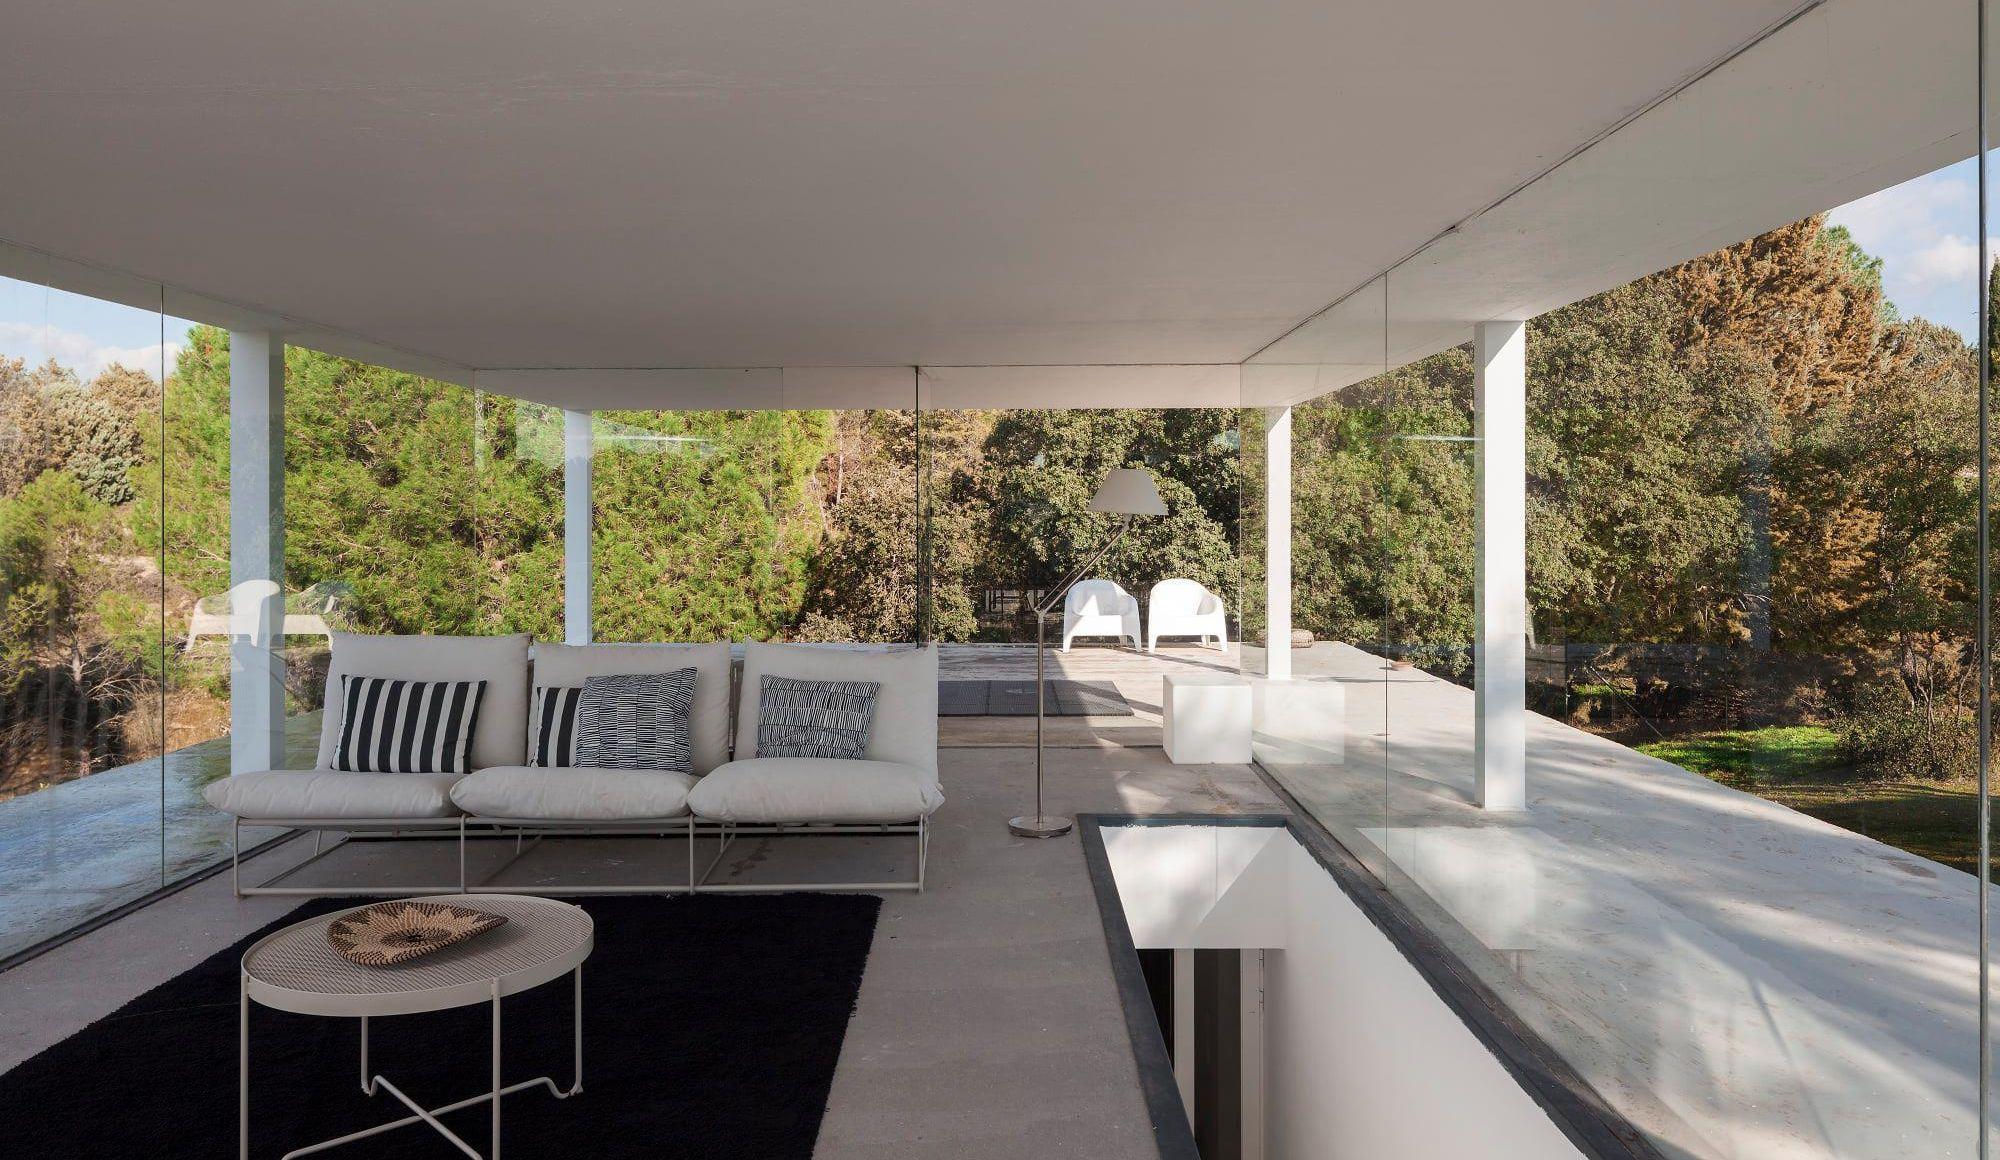 Glass-box villa Casa De Boas has offers panoramic views of the mountains outside Madrid